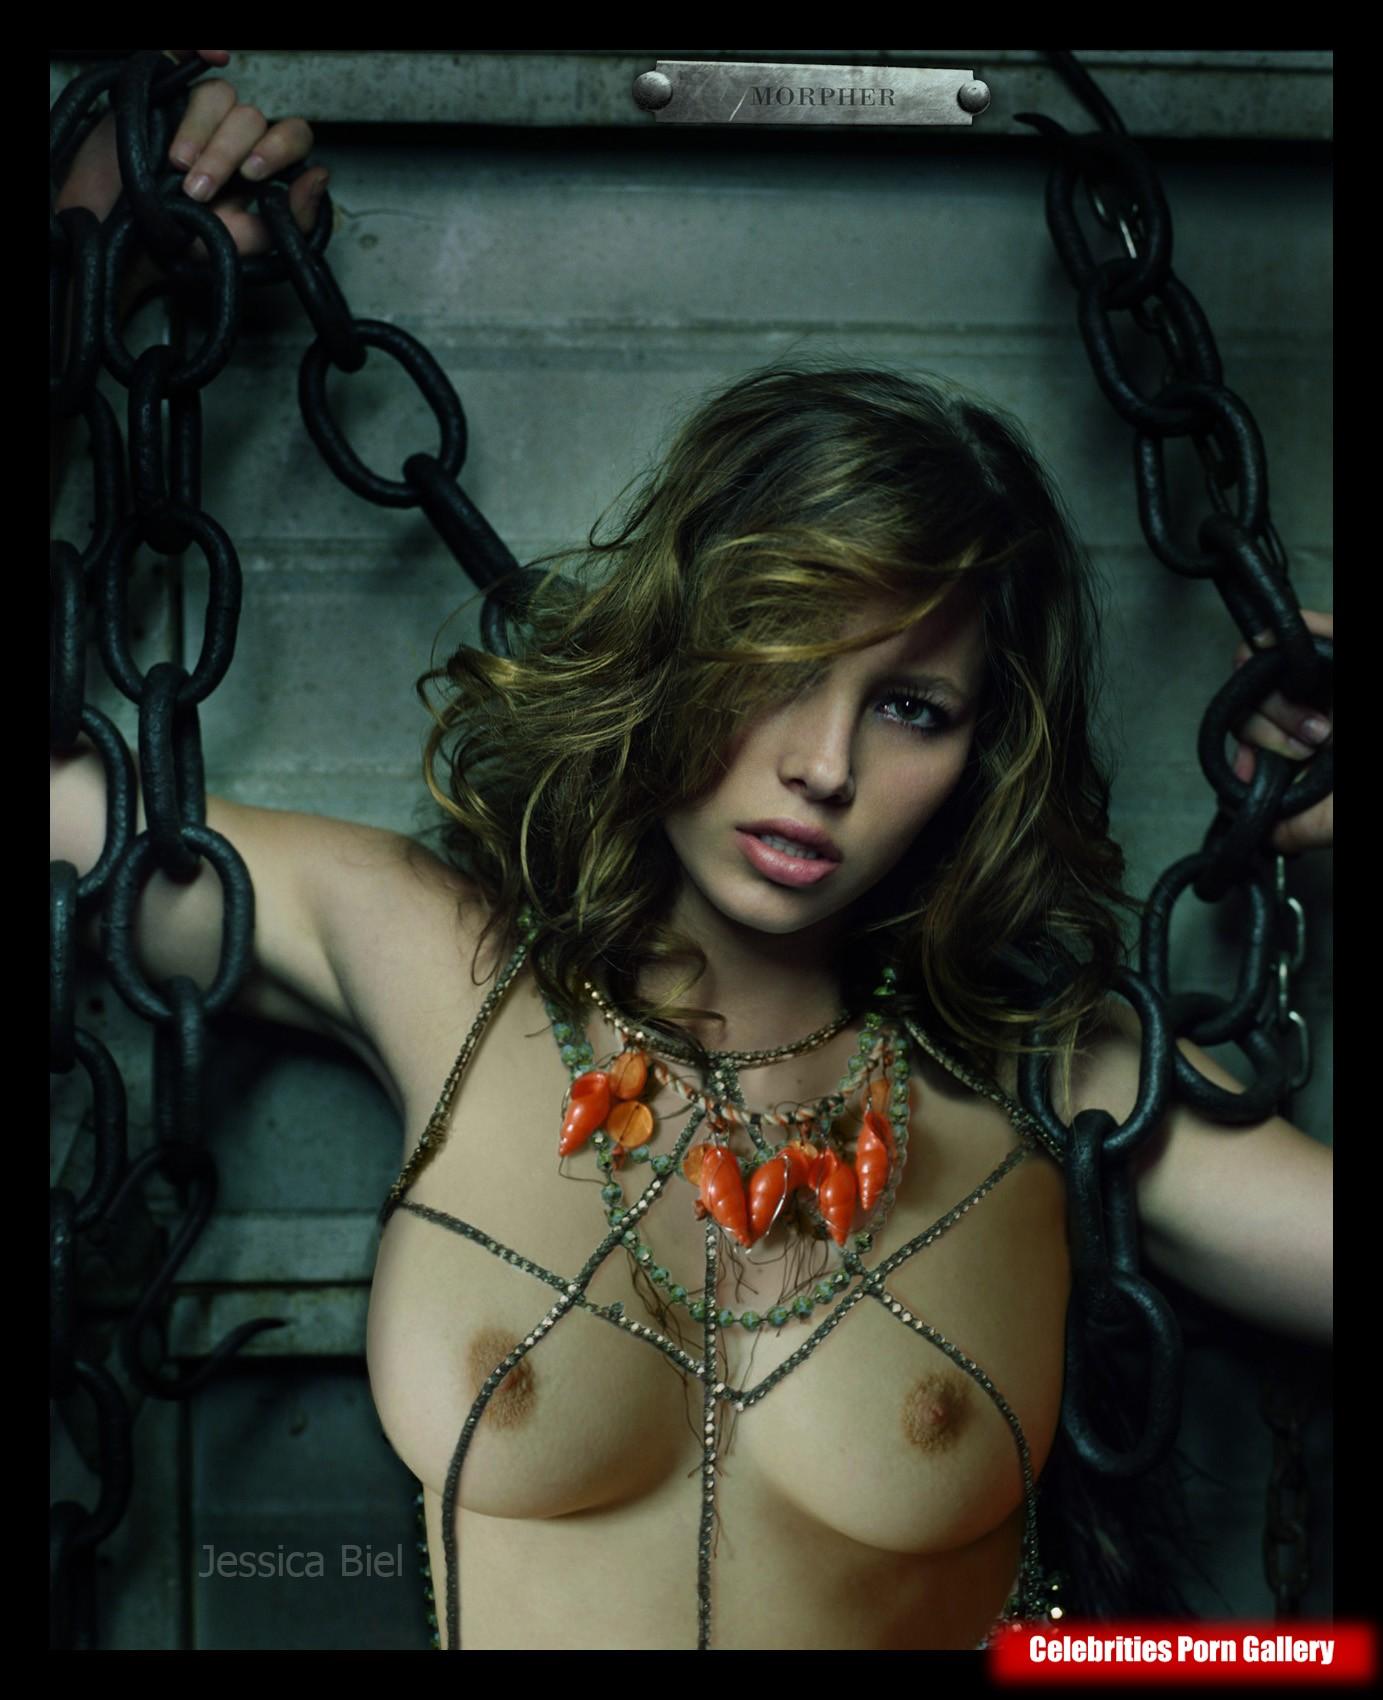 Jessica biel nude topless pics sex pics celebs unmasked